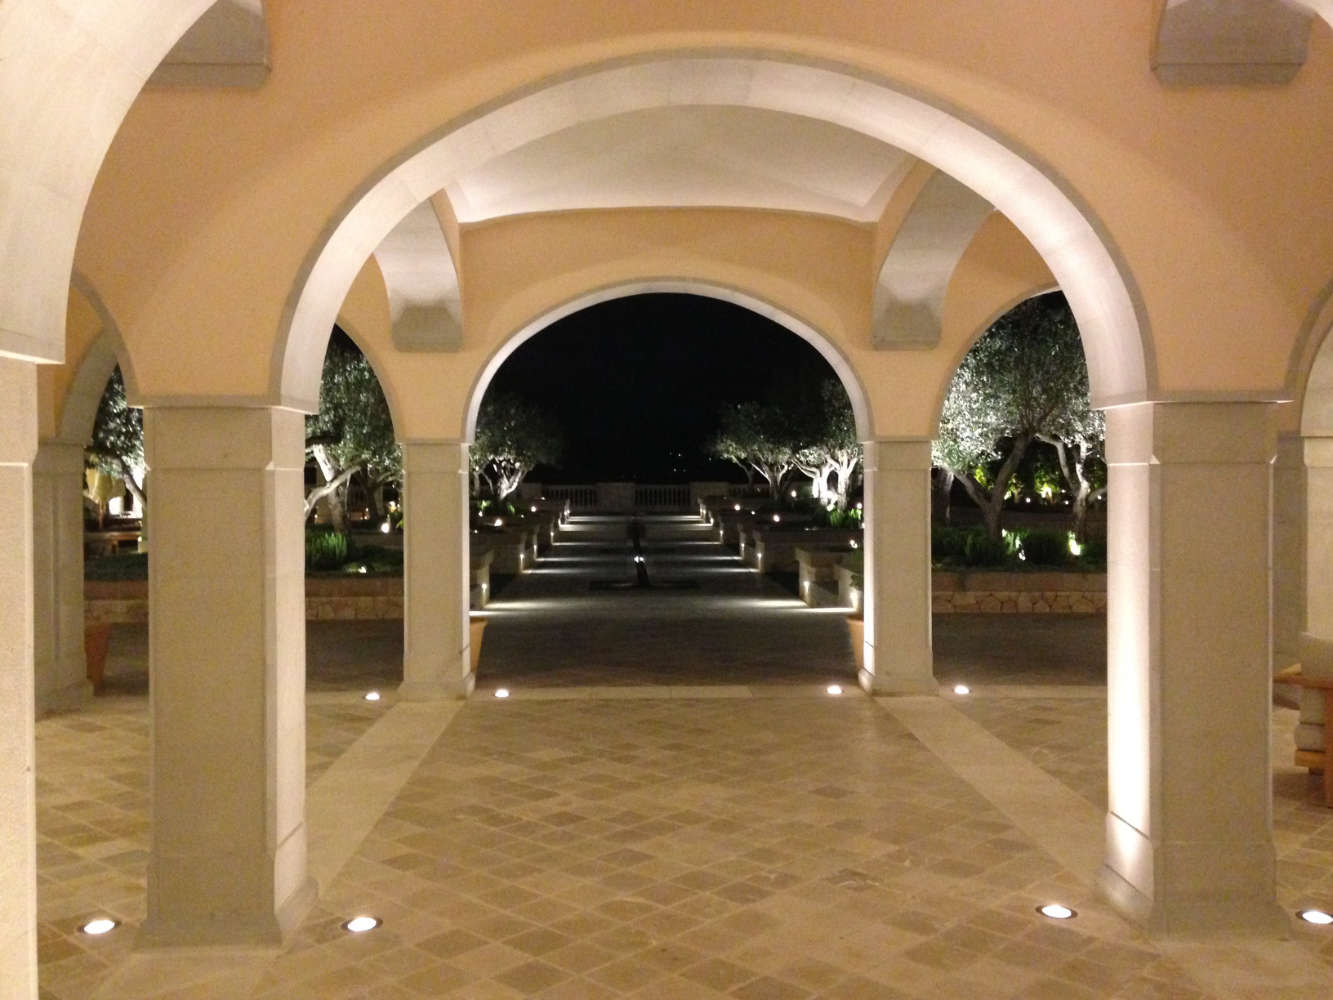 Das Park Hyatt Mallorca